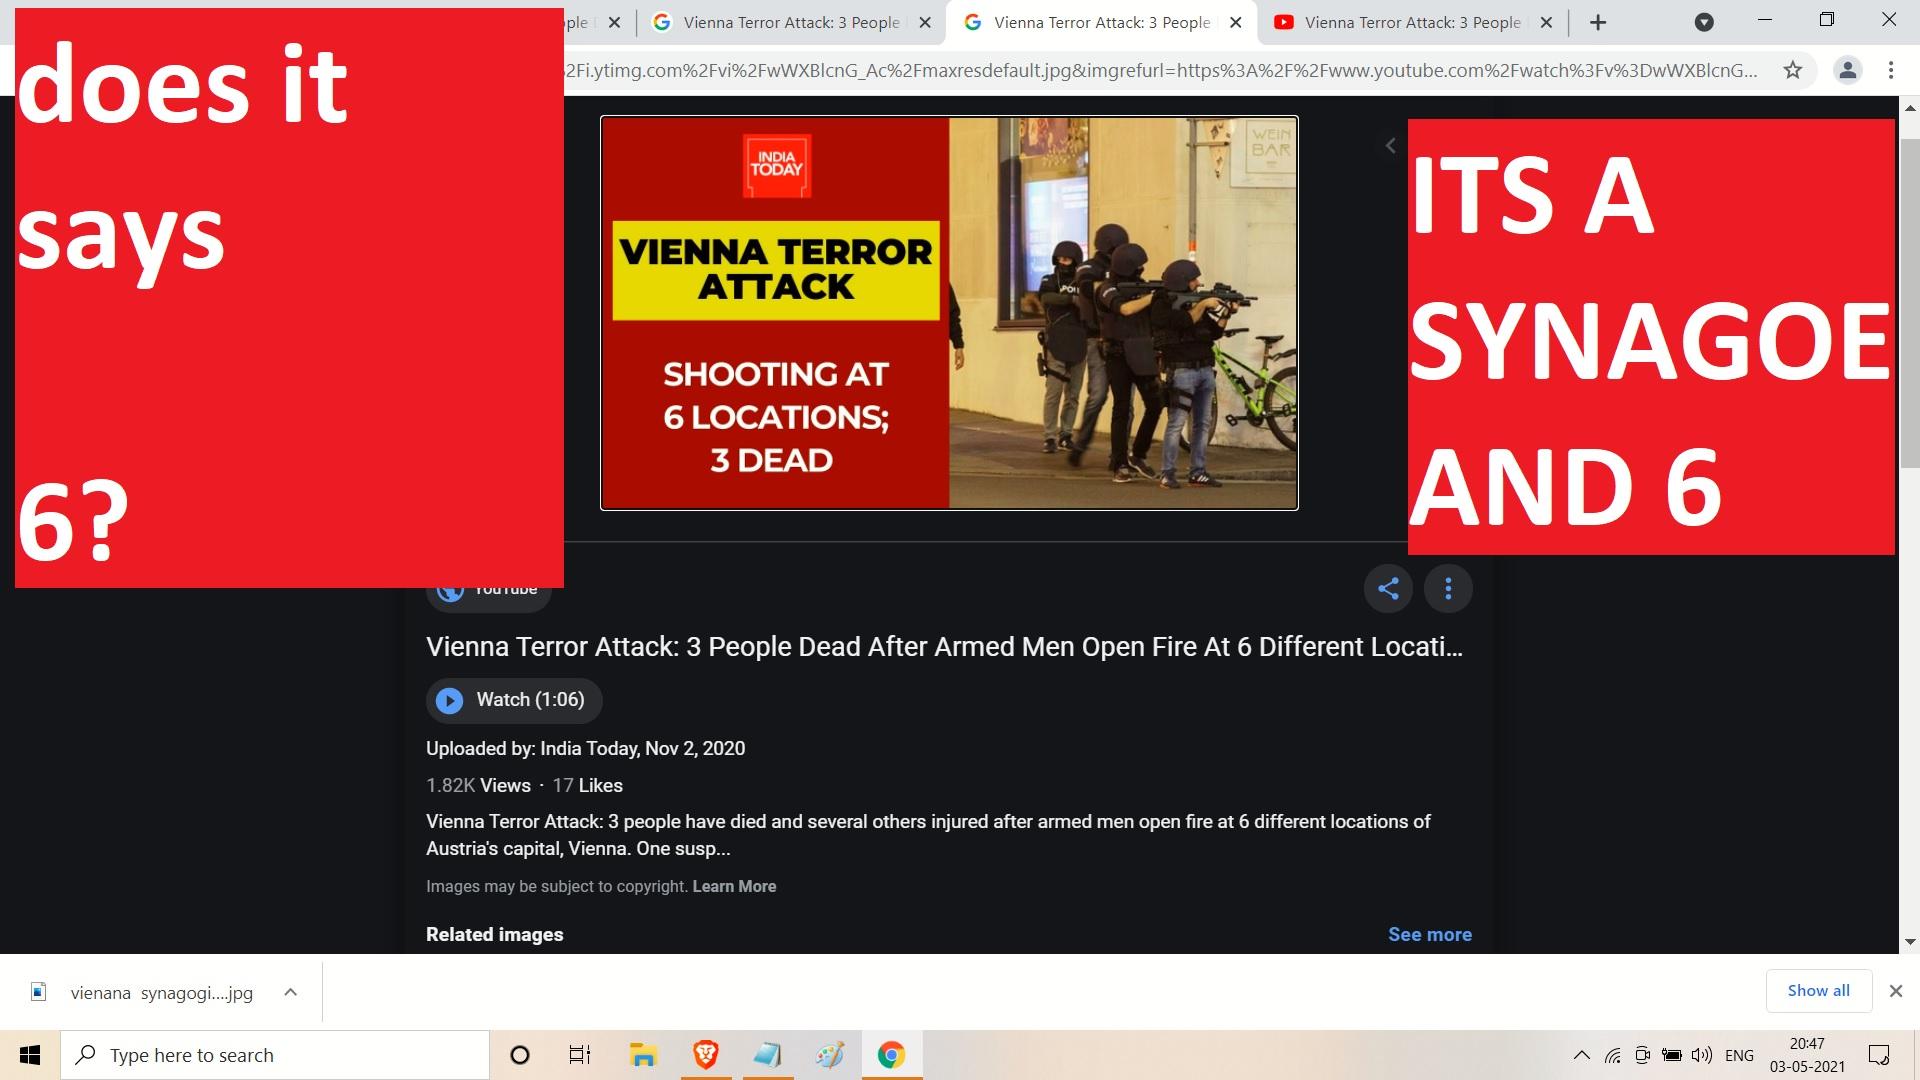 VIENNA 6 TERROIRST ISLAMIC TERAORIST LOCATIONS - ONE AT JEWISH SYNAGOGUE